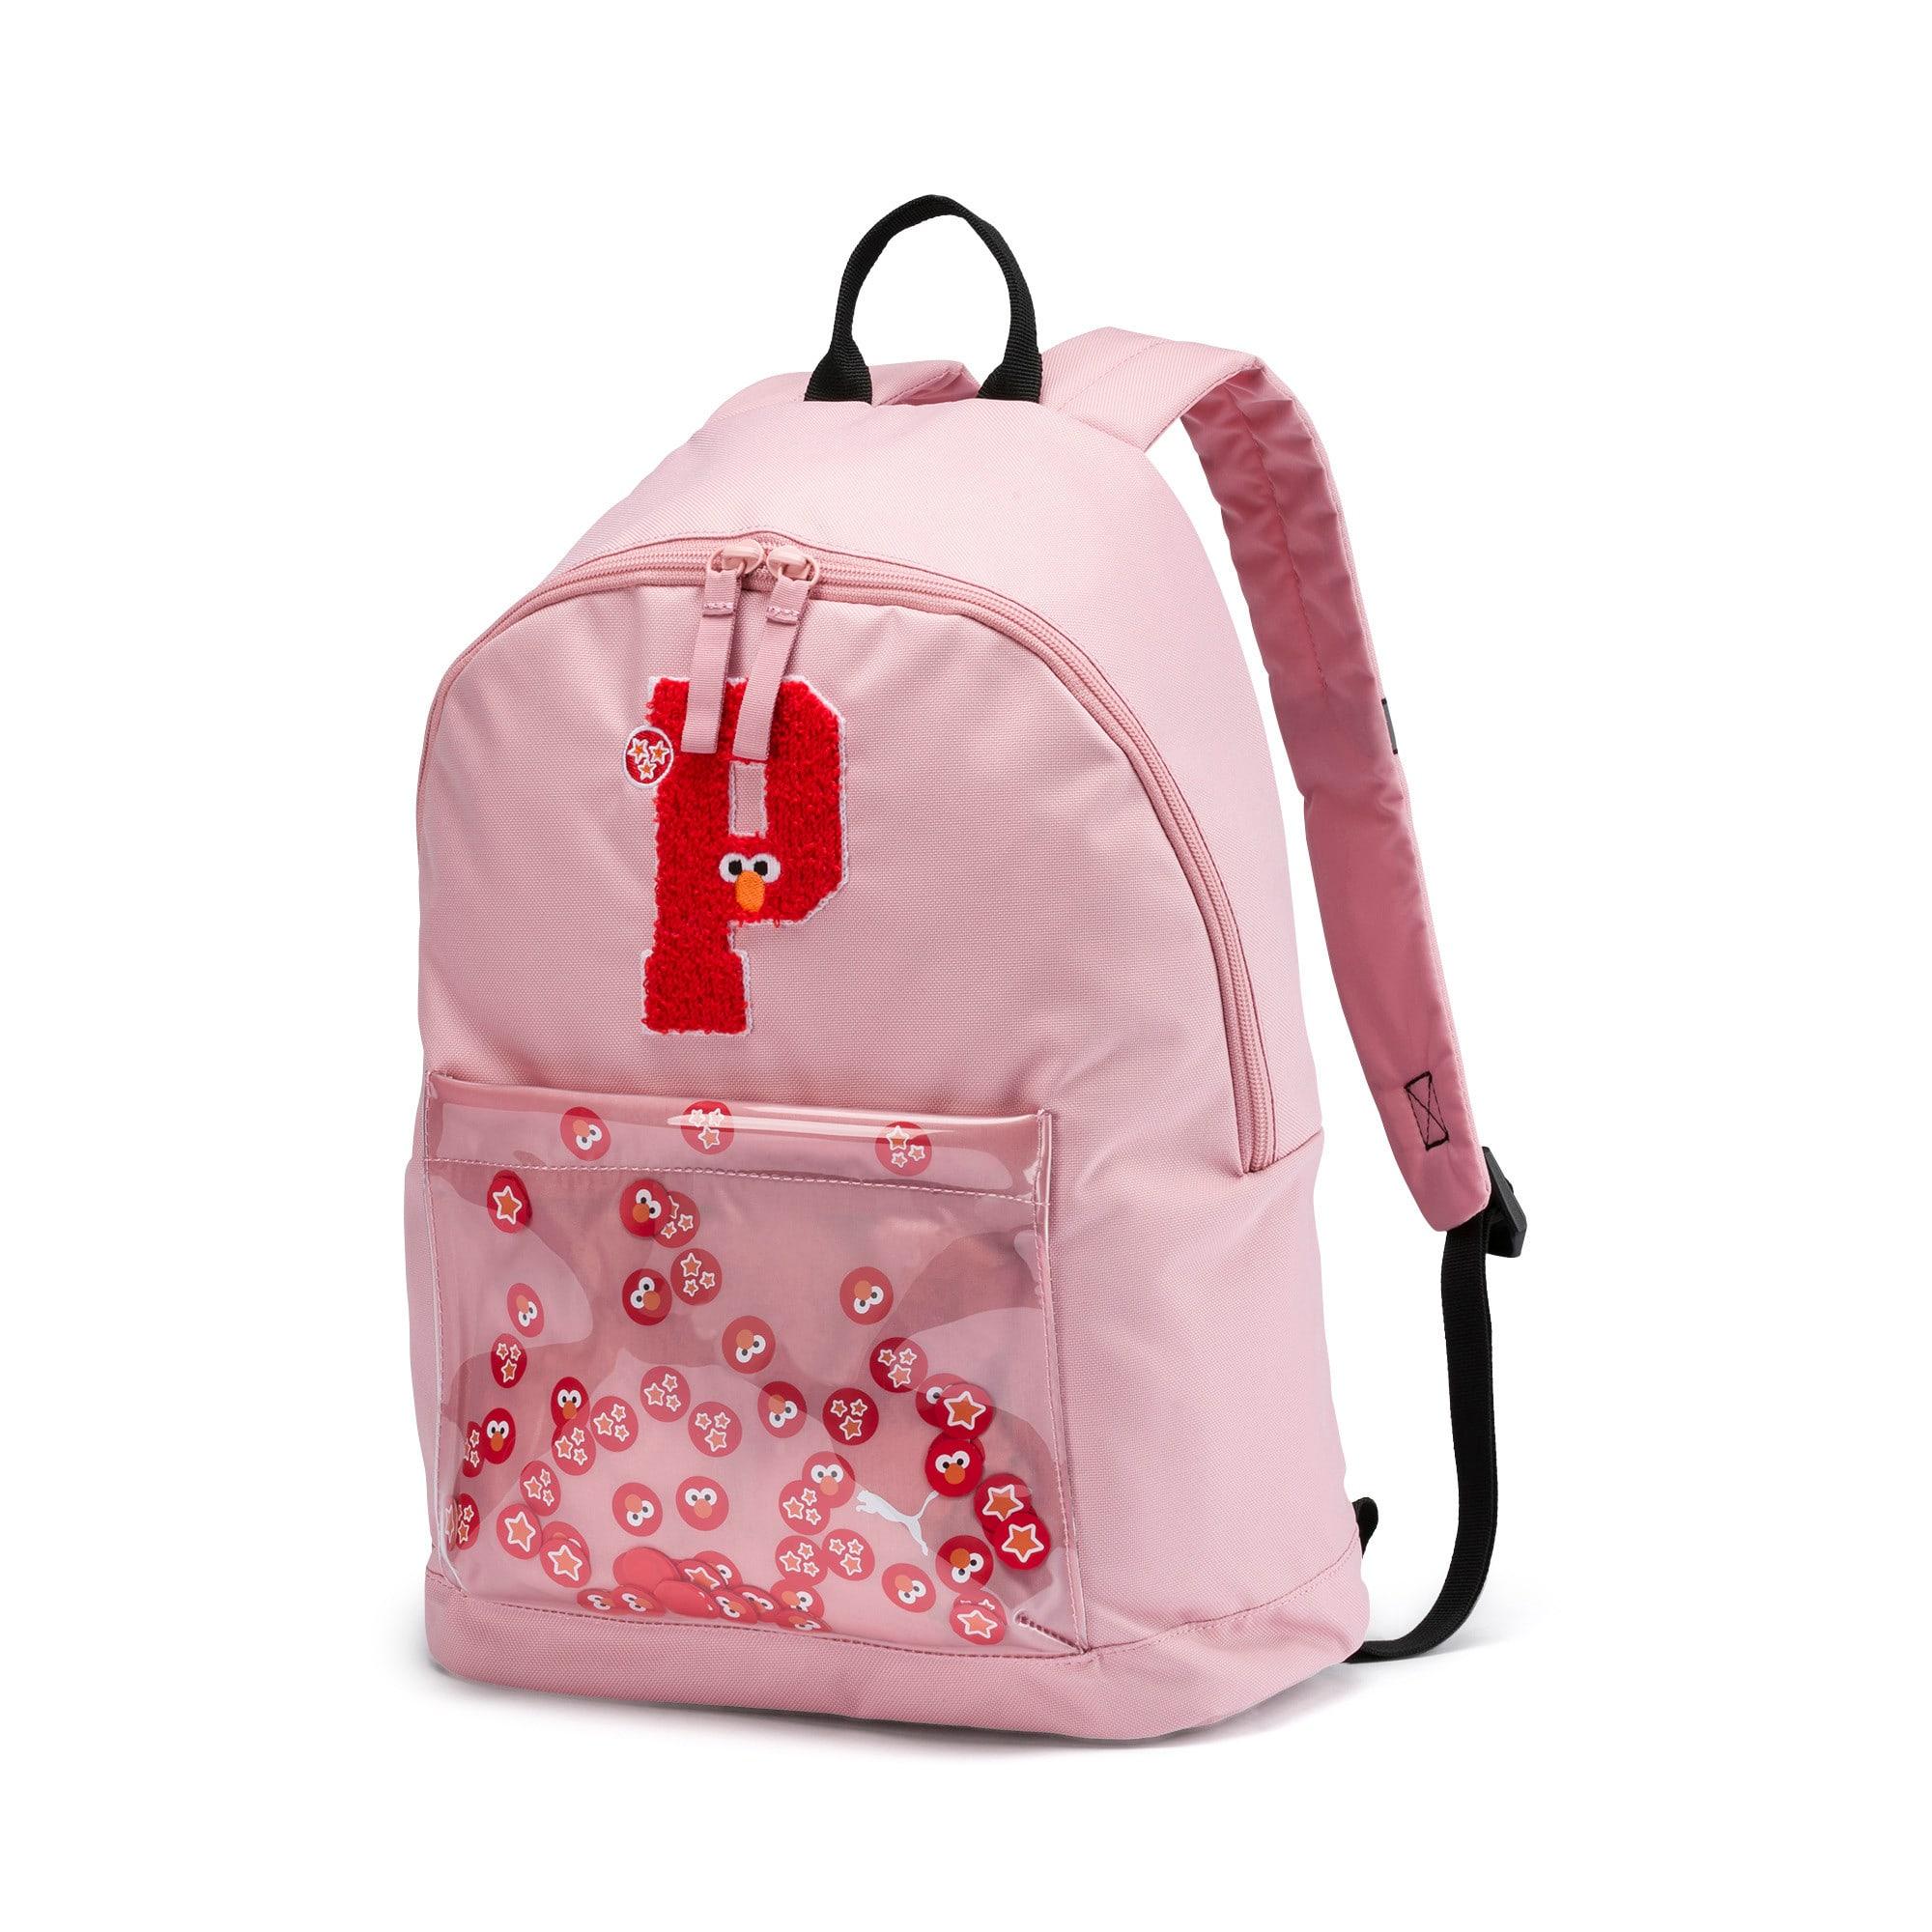 Thumbnail 1 of PUMA x SESAME STREET Kids' Sport Backpack, Bridal Rose, medium